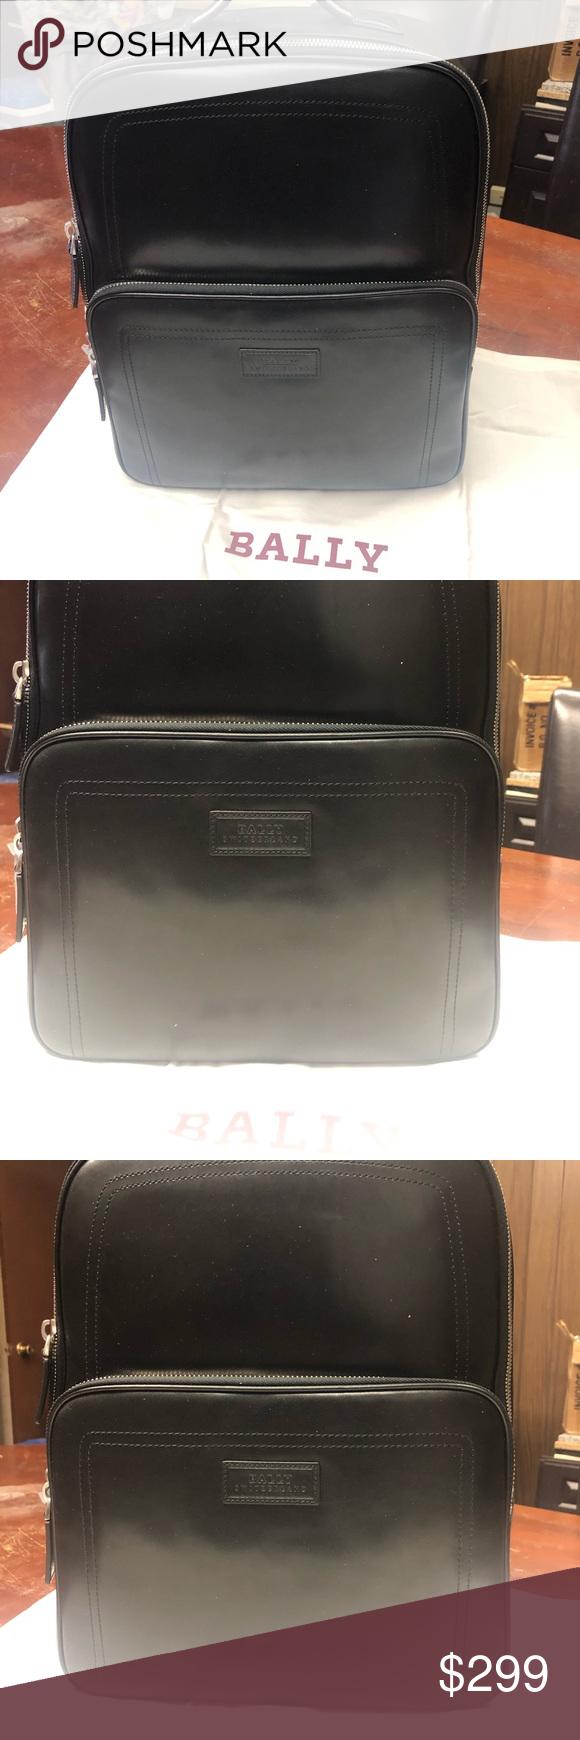 ed1ff7e991 Bally backpack Leather classic backpack Bally Bags Backpacks